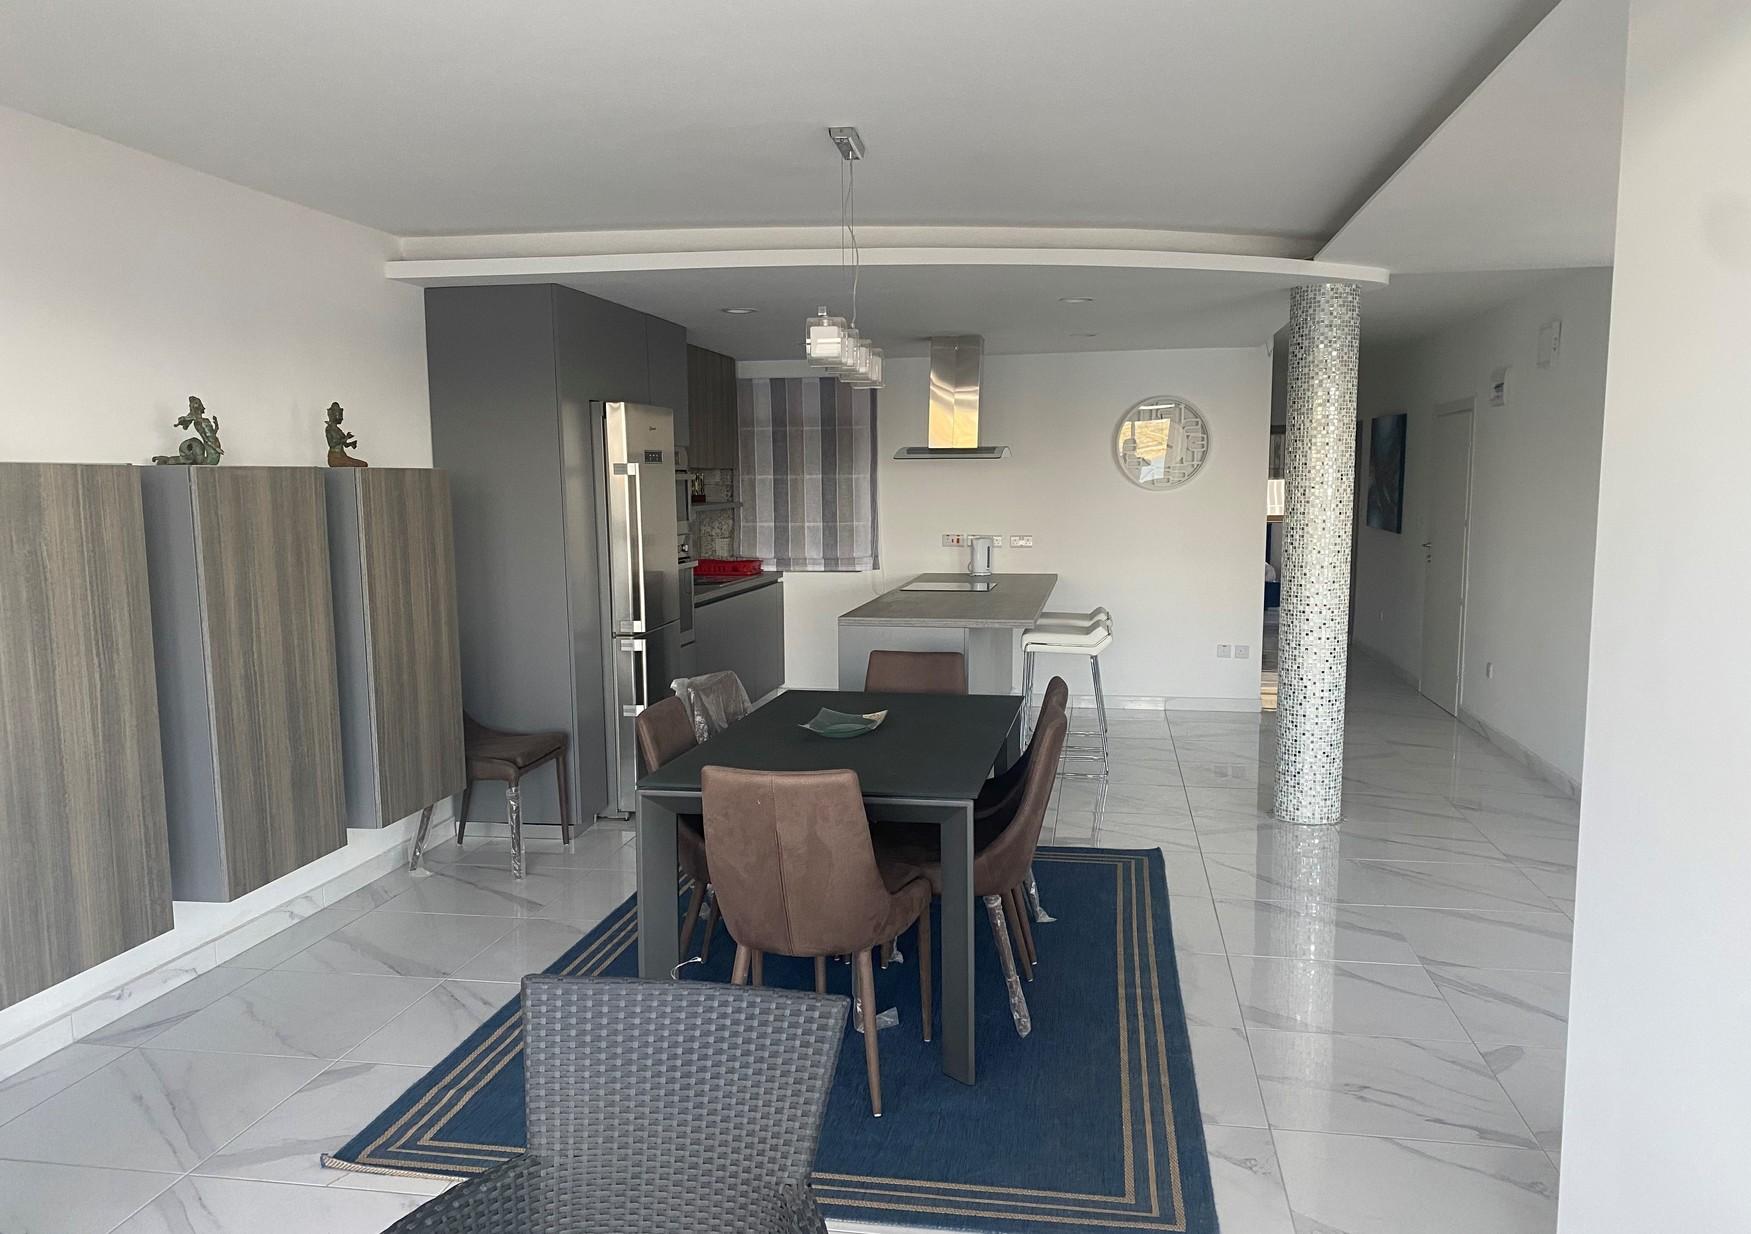 3 bed Apartment For Rent in Qawra, Qawra - thumb 5